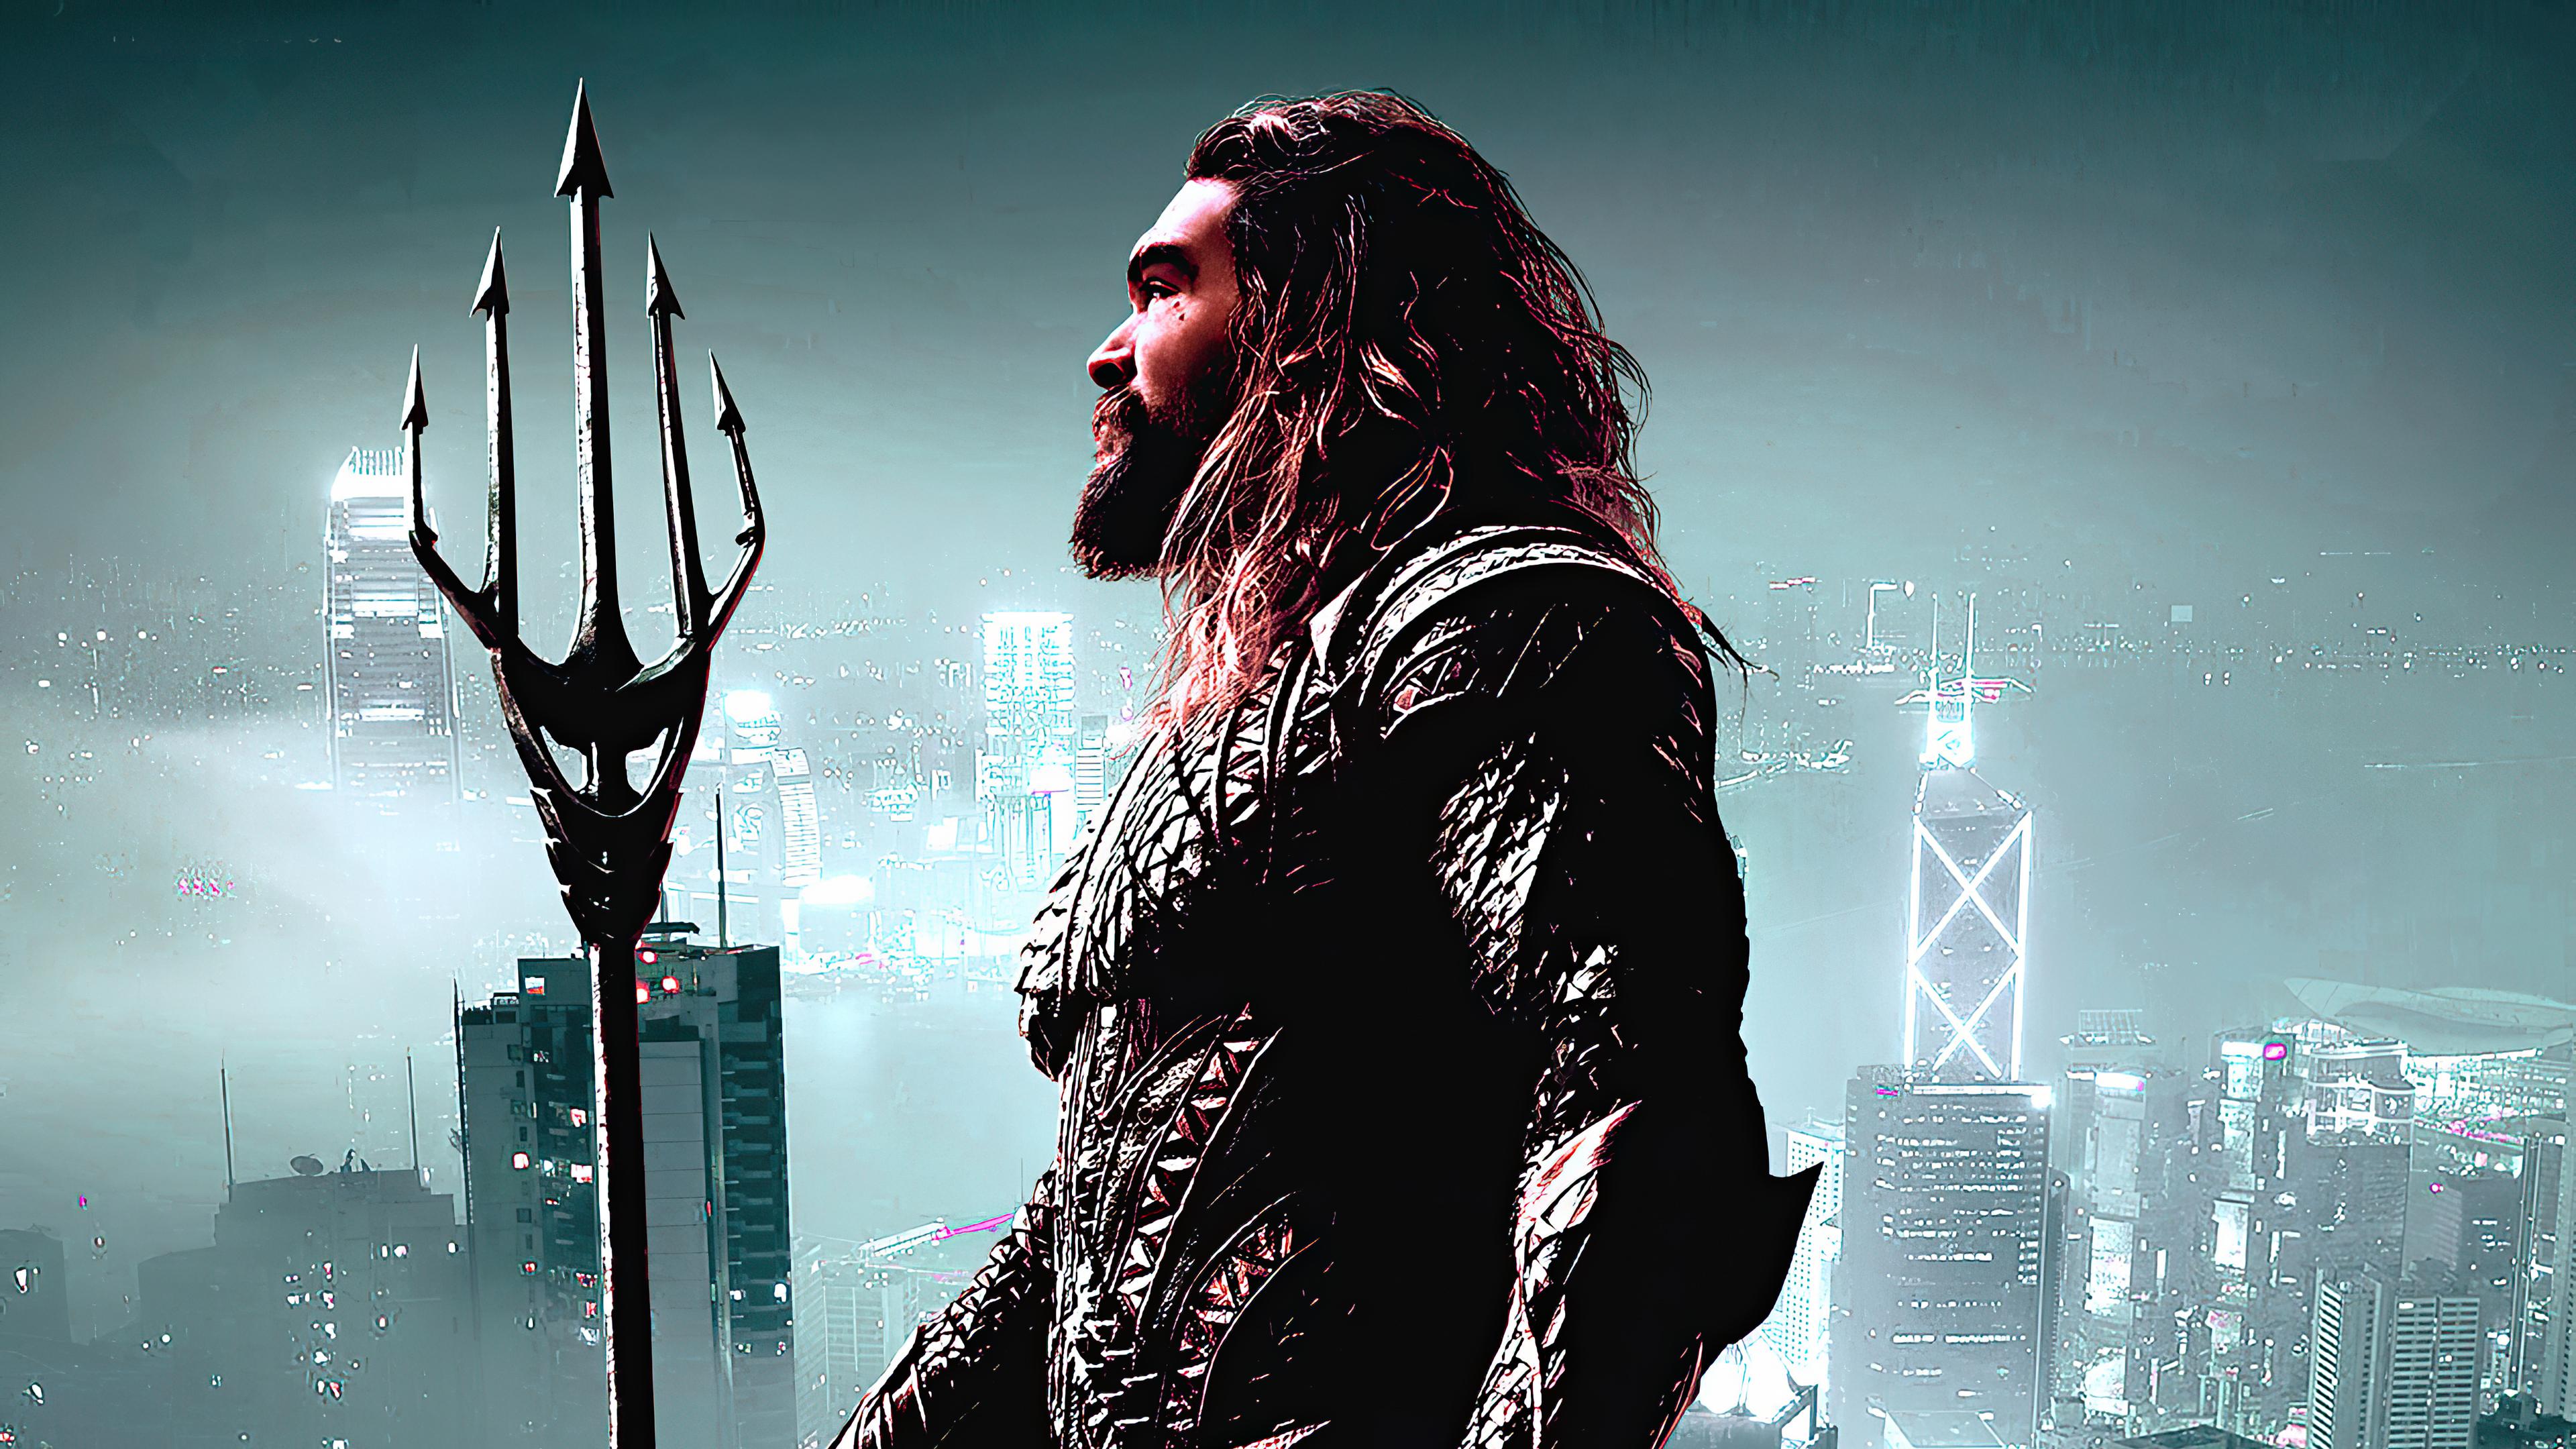 aquaman justice league 2020 1596916024 - Aquaman Justice League 2020 -